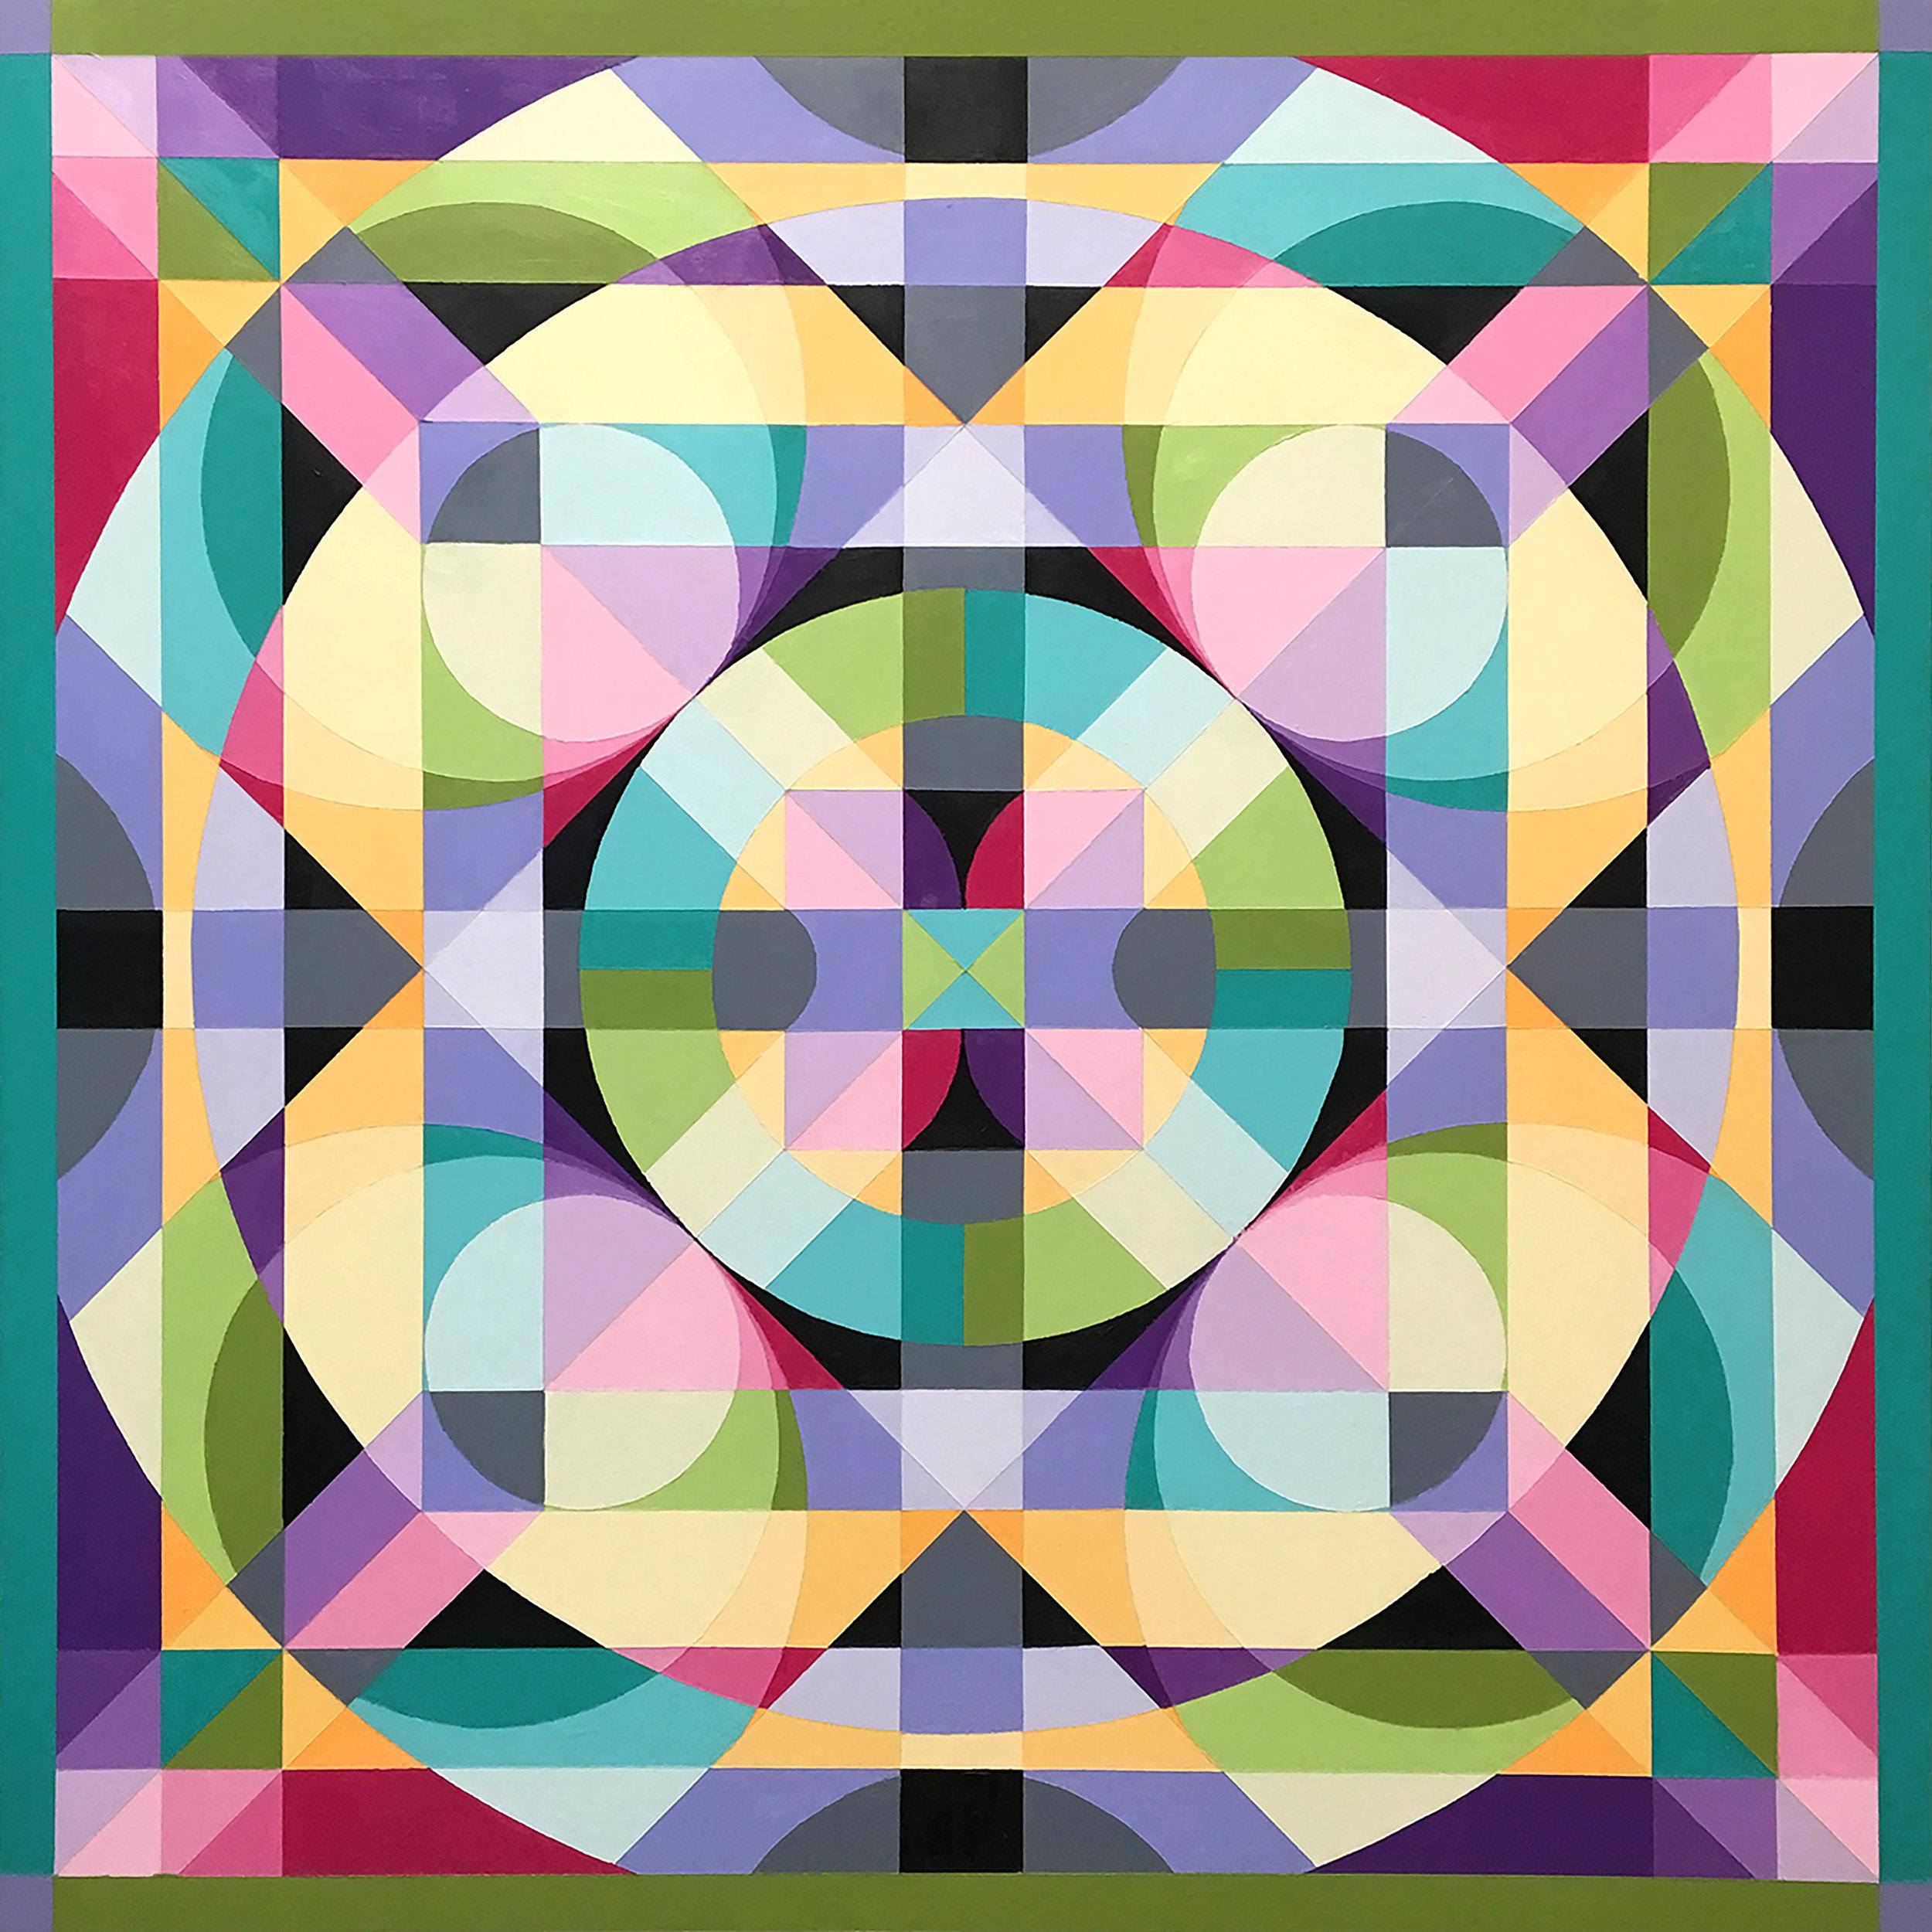 Square Spots 6